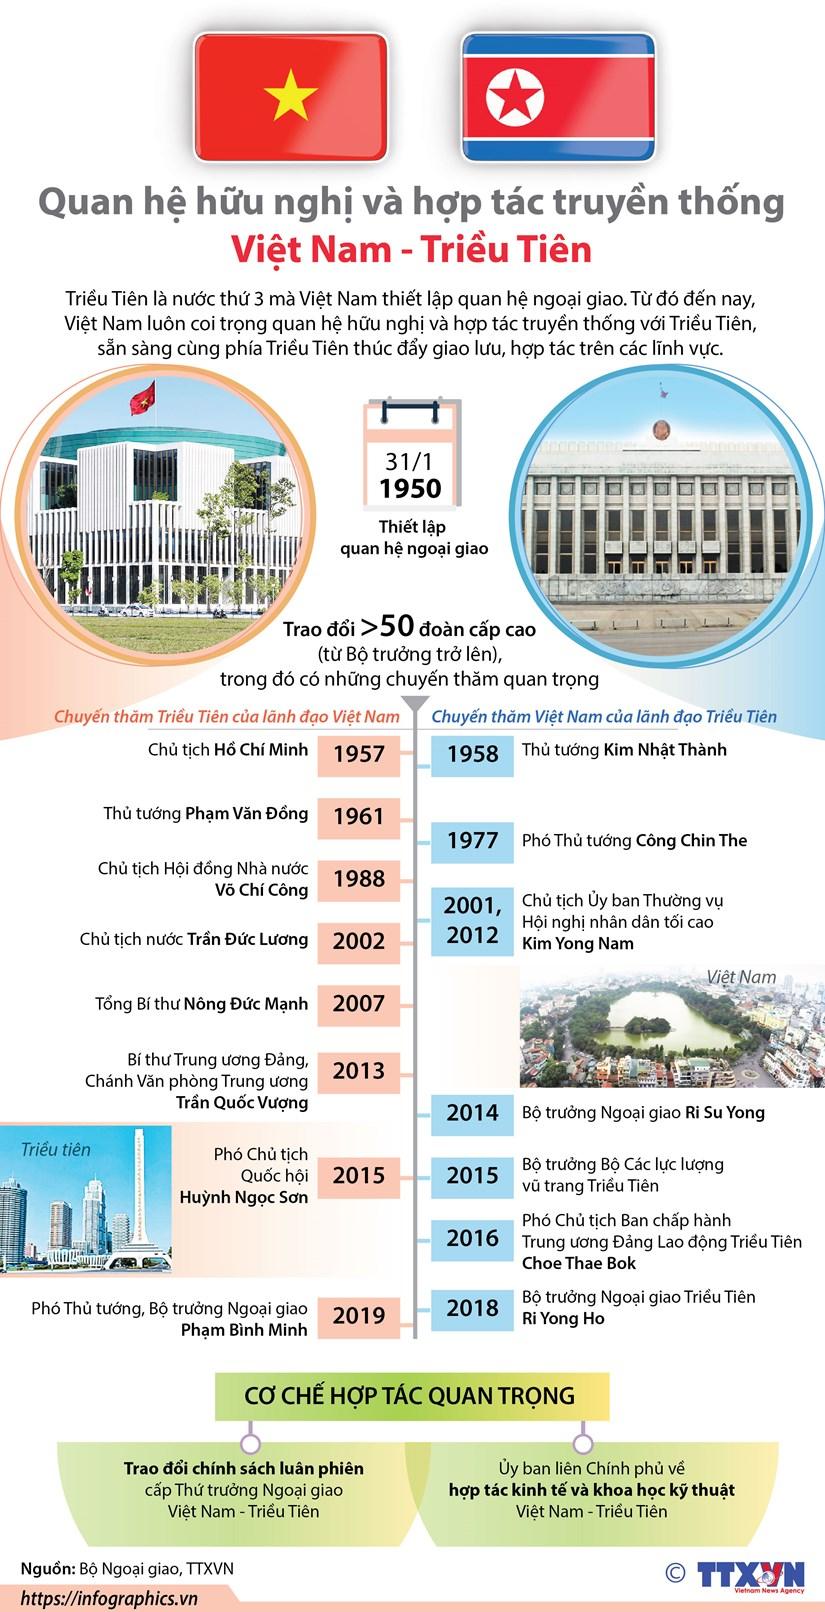 [Infographics] Quan he huu nghi hop tac Viet Nam-Trieu Tien hinh anh 1